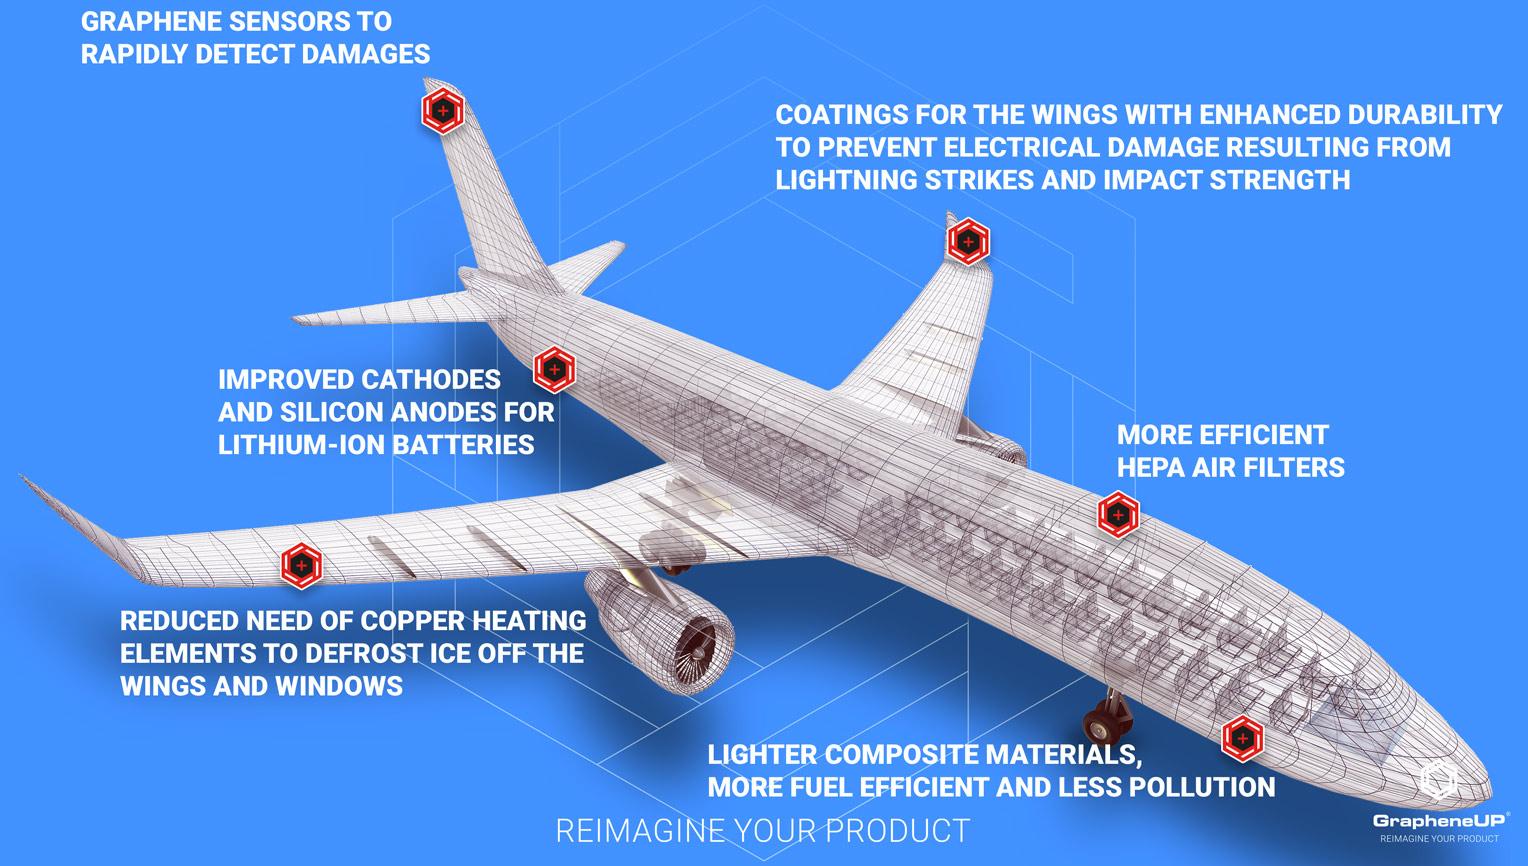 graphene enhanced product aircraft